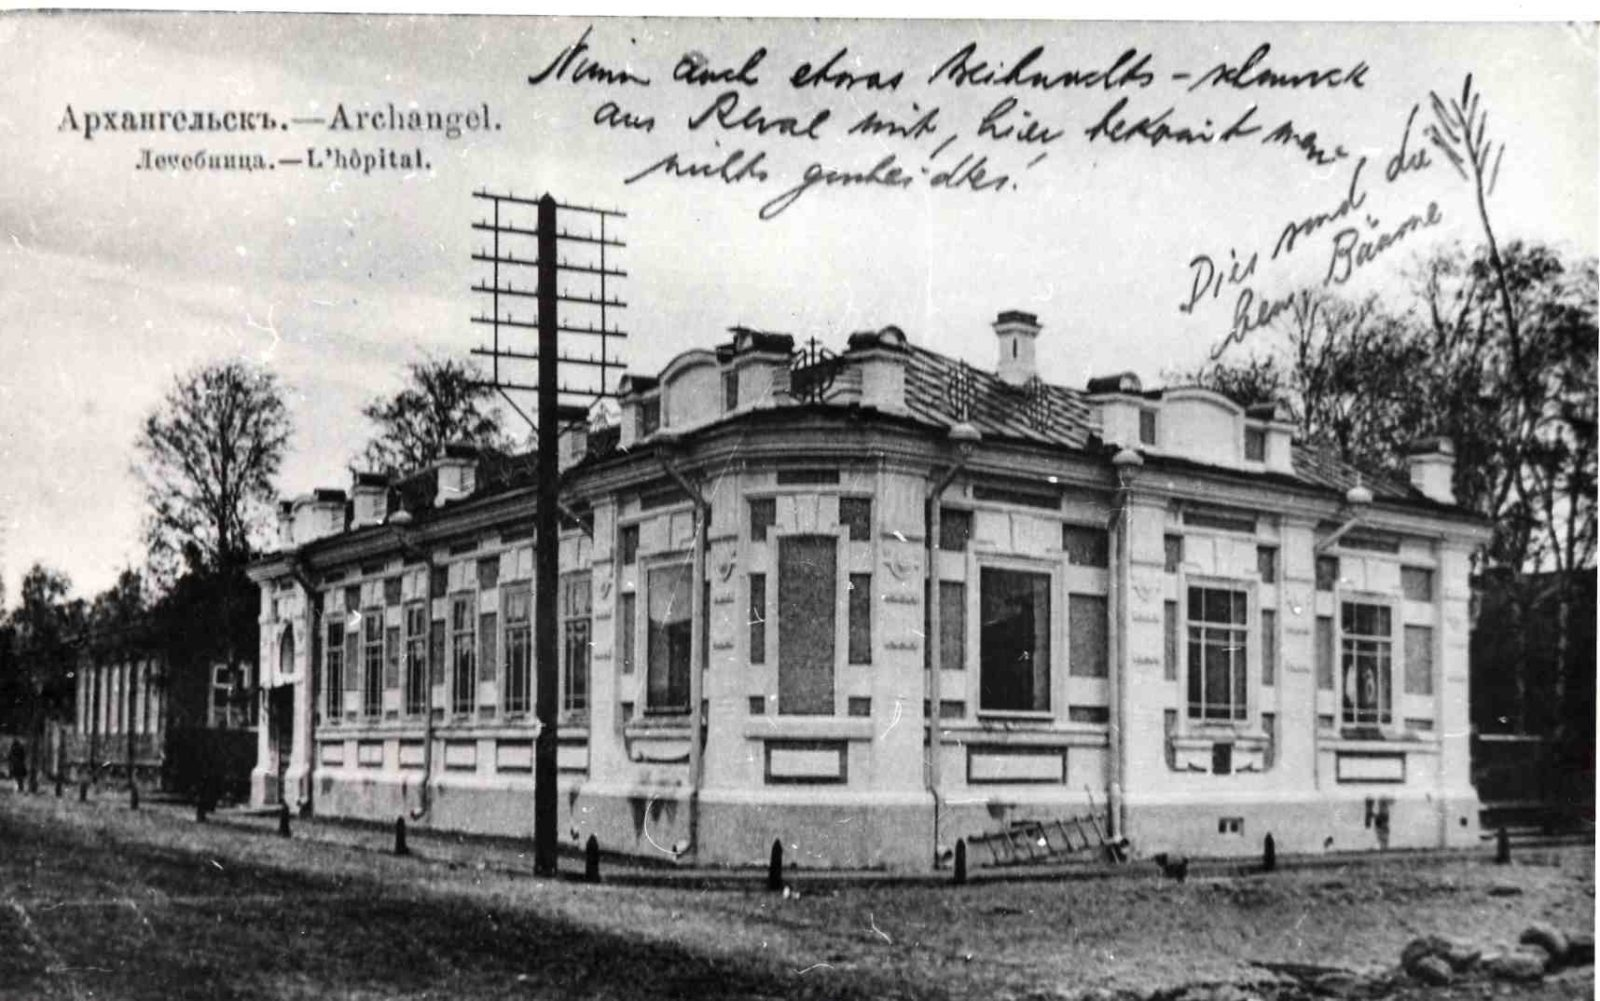 The hospital of Emperor Alexander II - Arkhangelsk (Archangel)